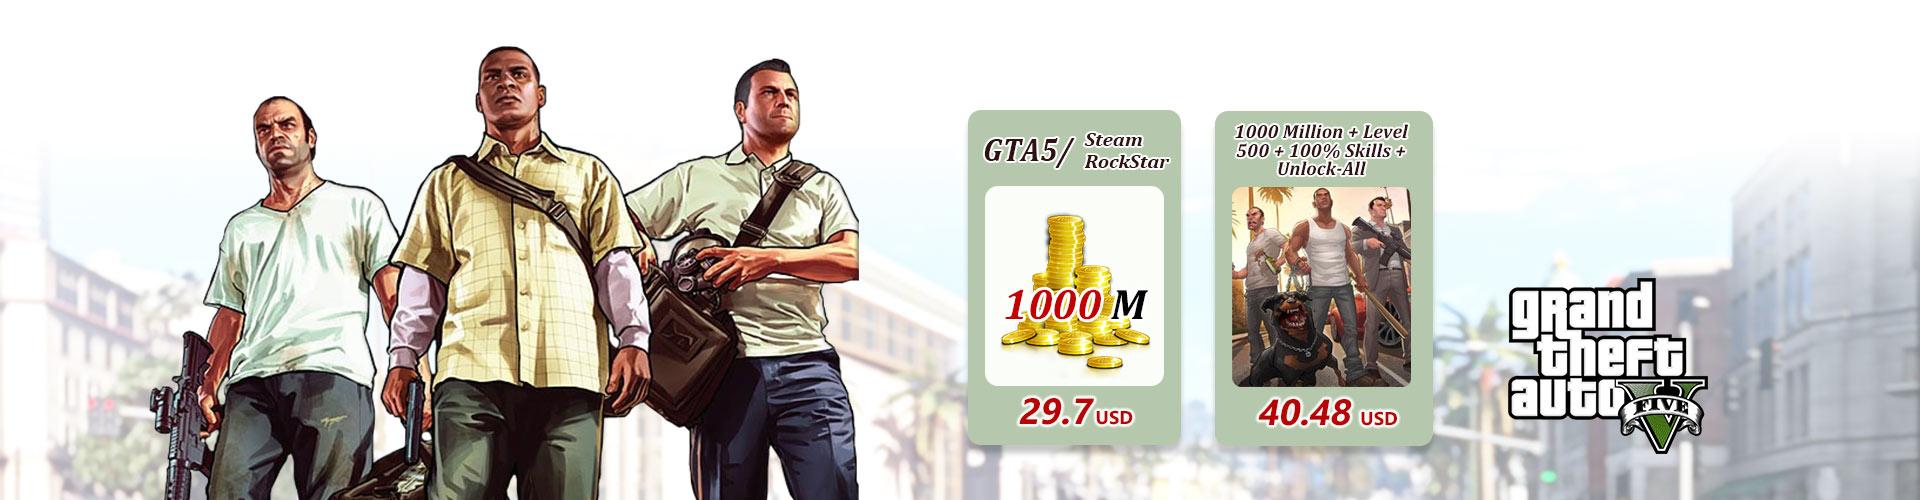 GVGMall GTA 5